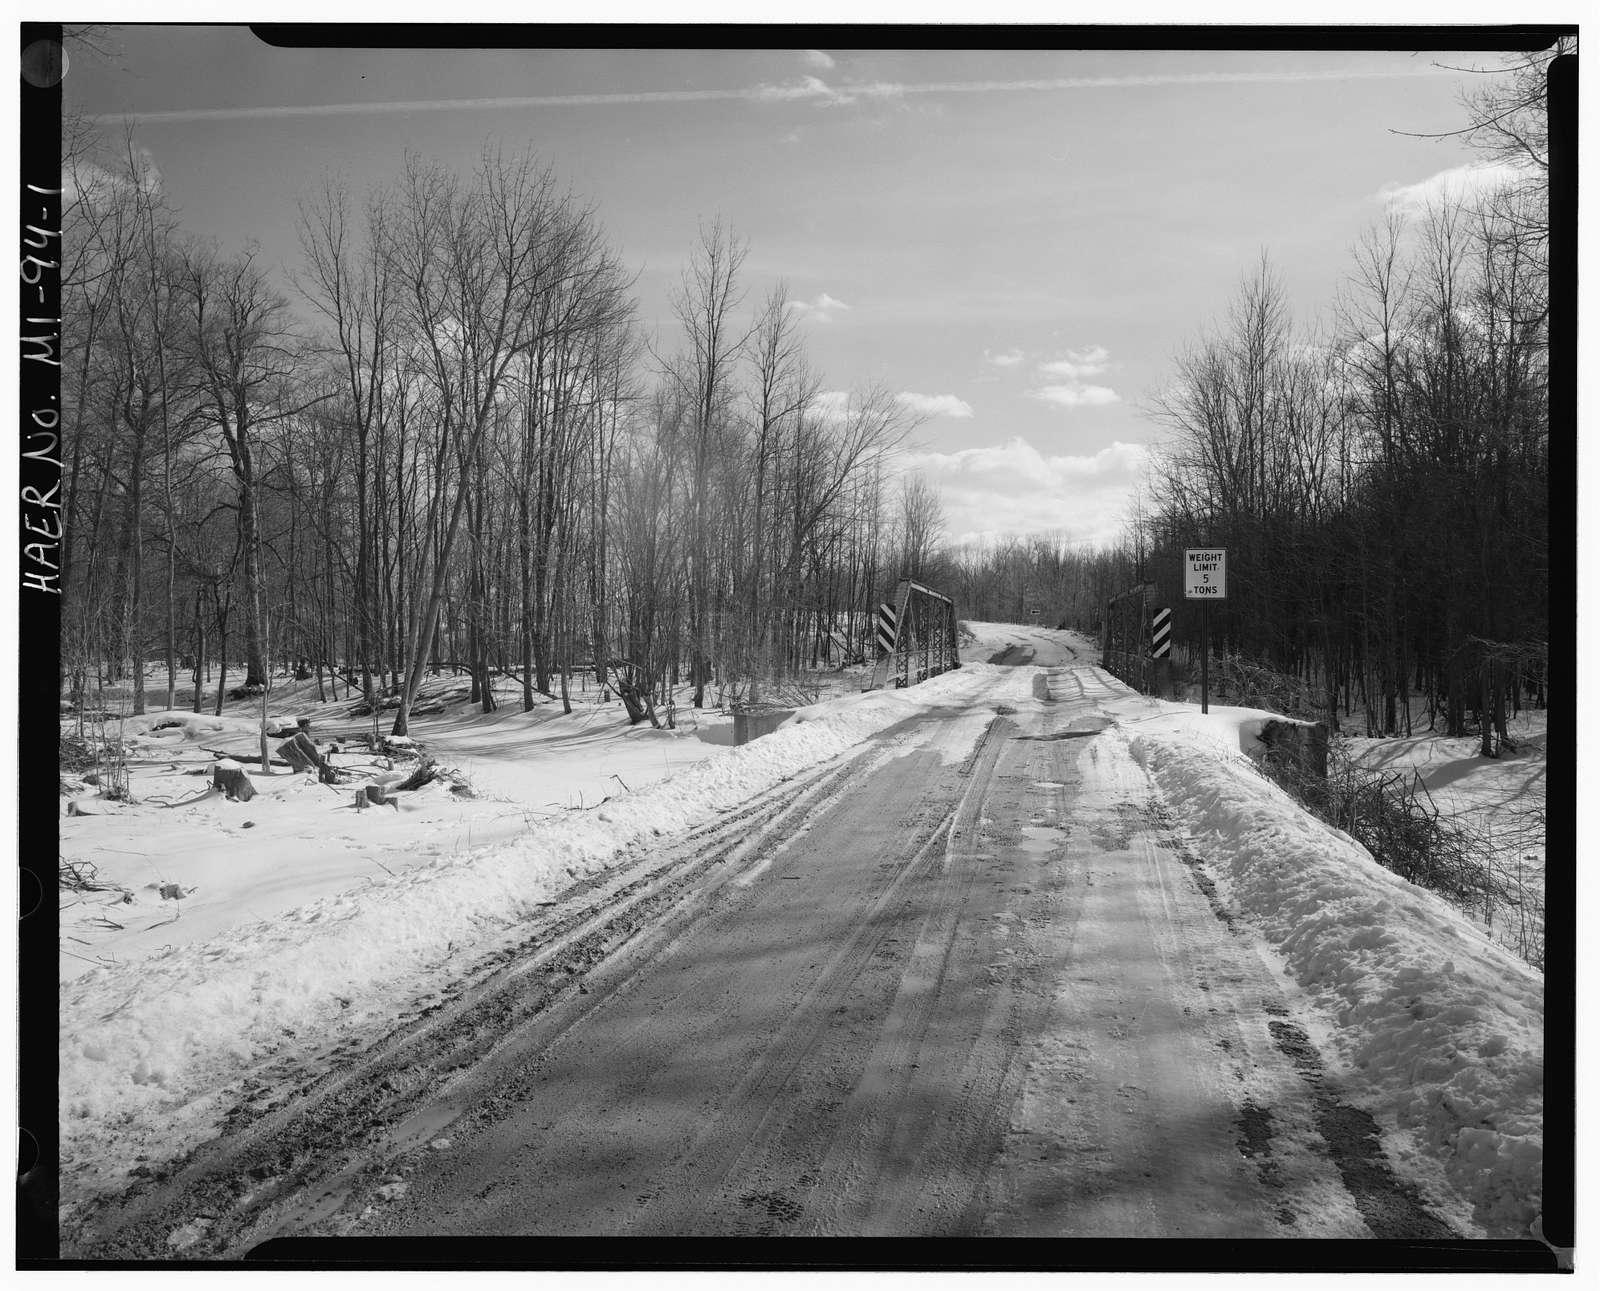 Mason Road Bridge, Spanning Bad River, Ithaca, Gratiot County, MI